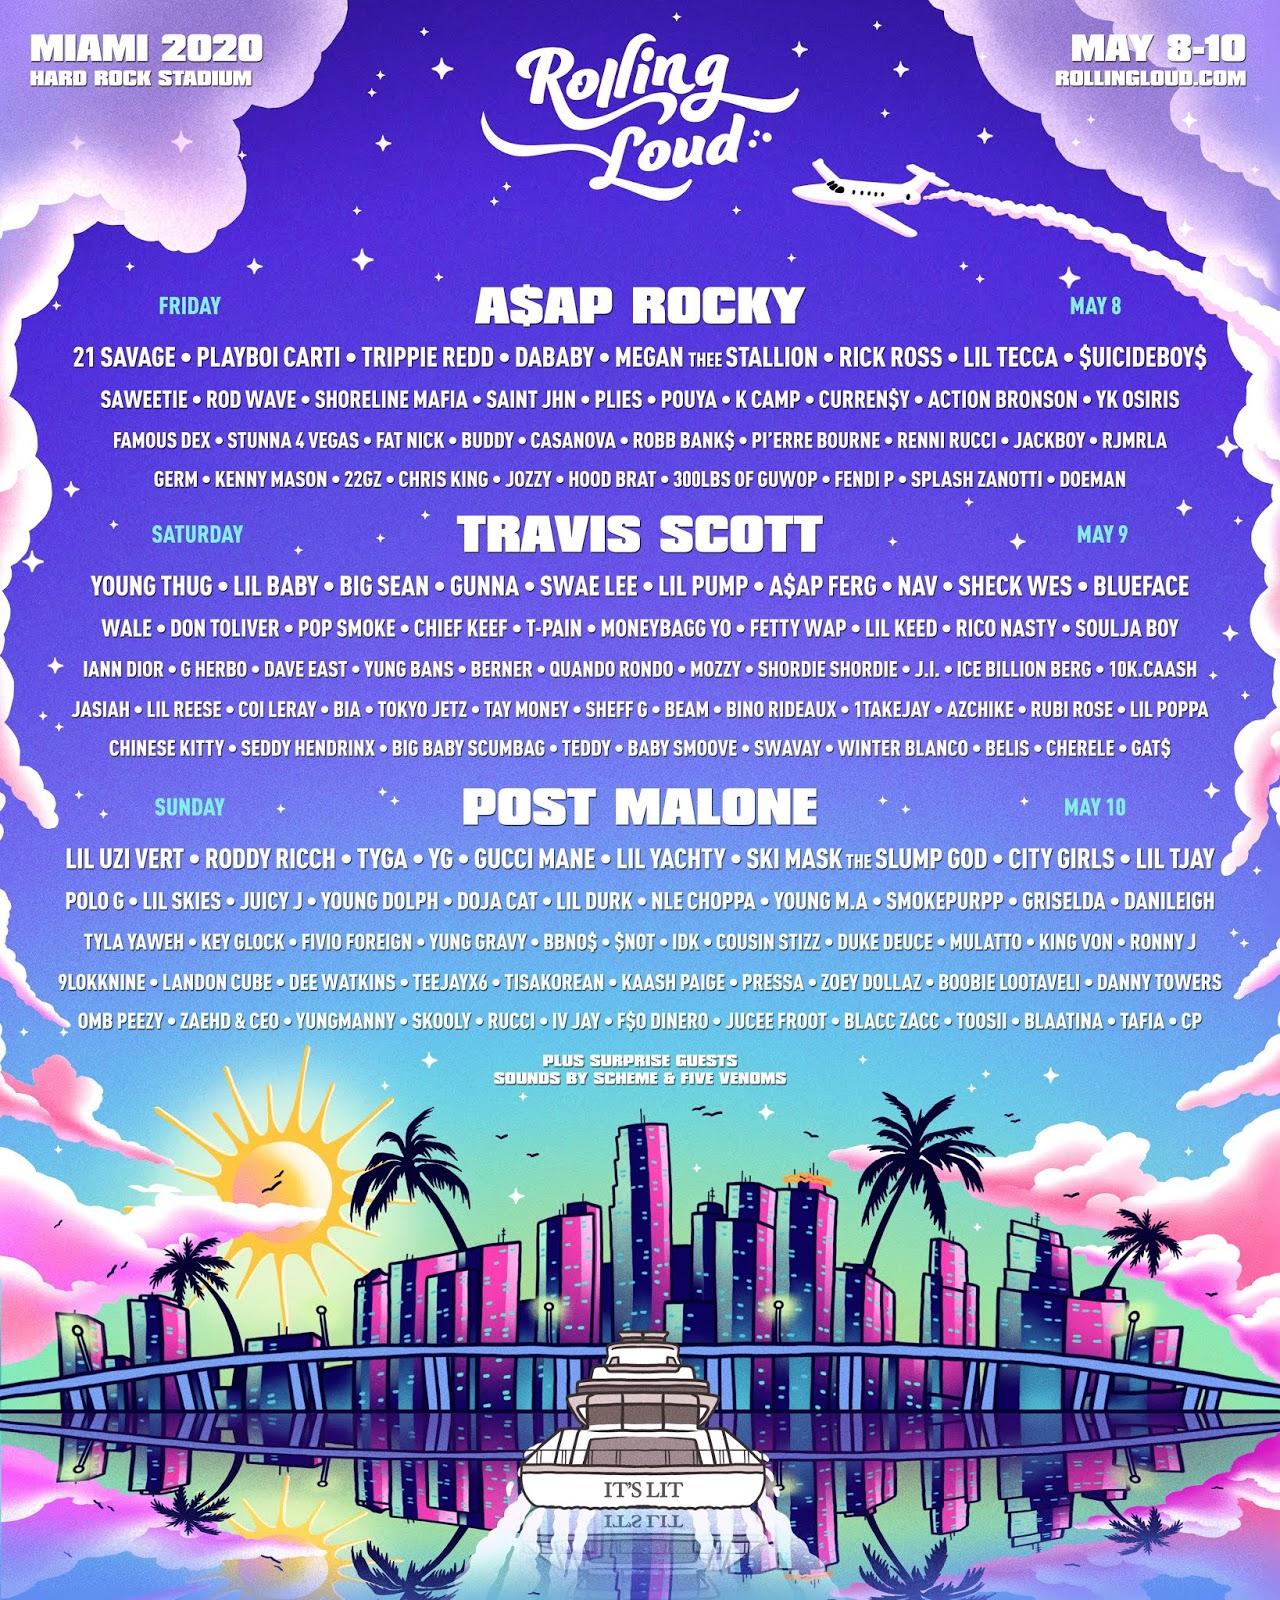 Travis Scott, A$AP Rocky & Post Malone To Headline Rolling Loud Miami 2020